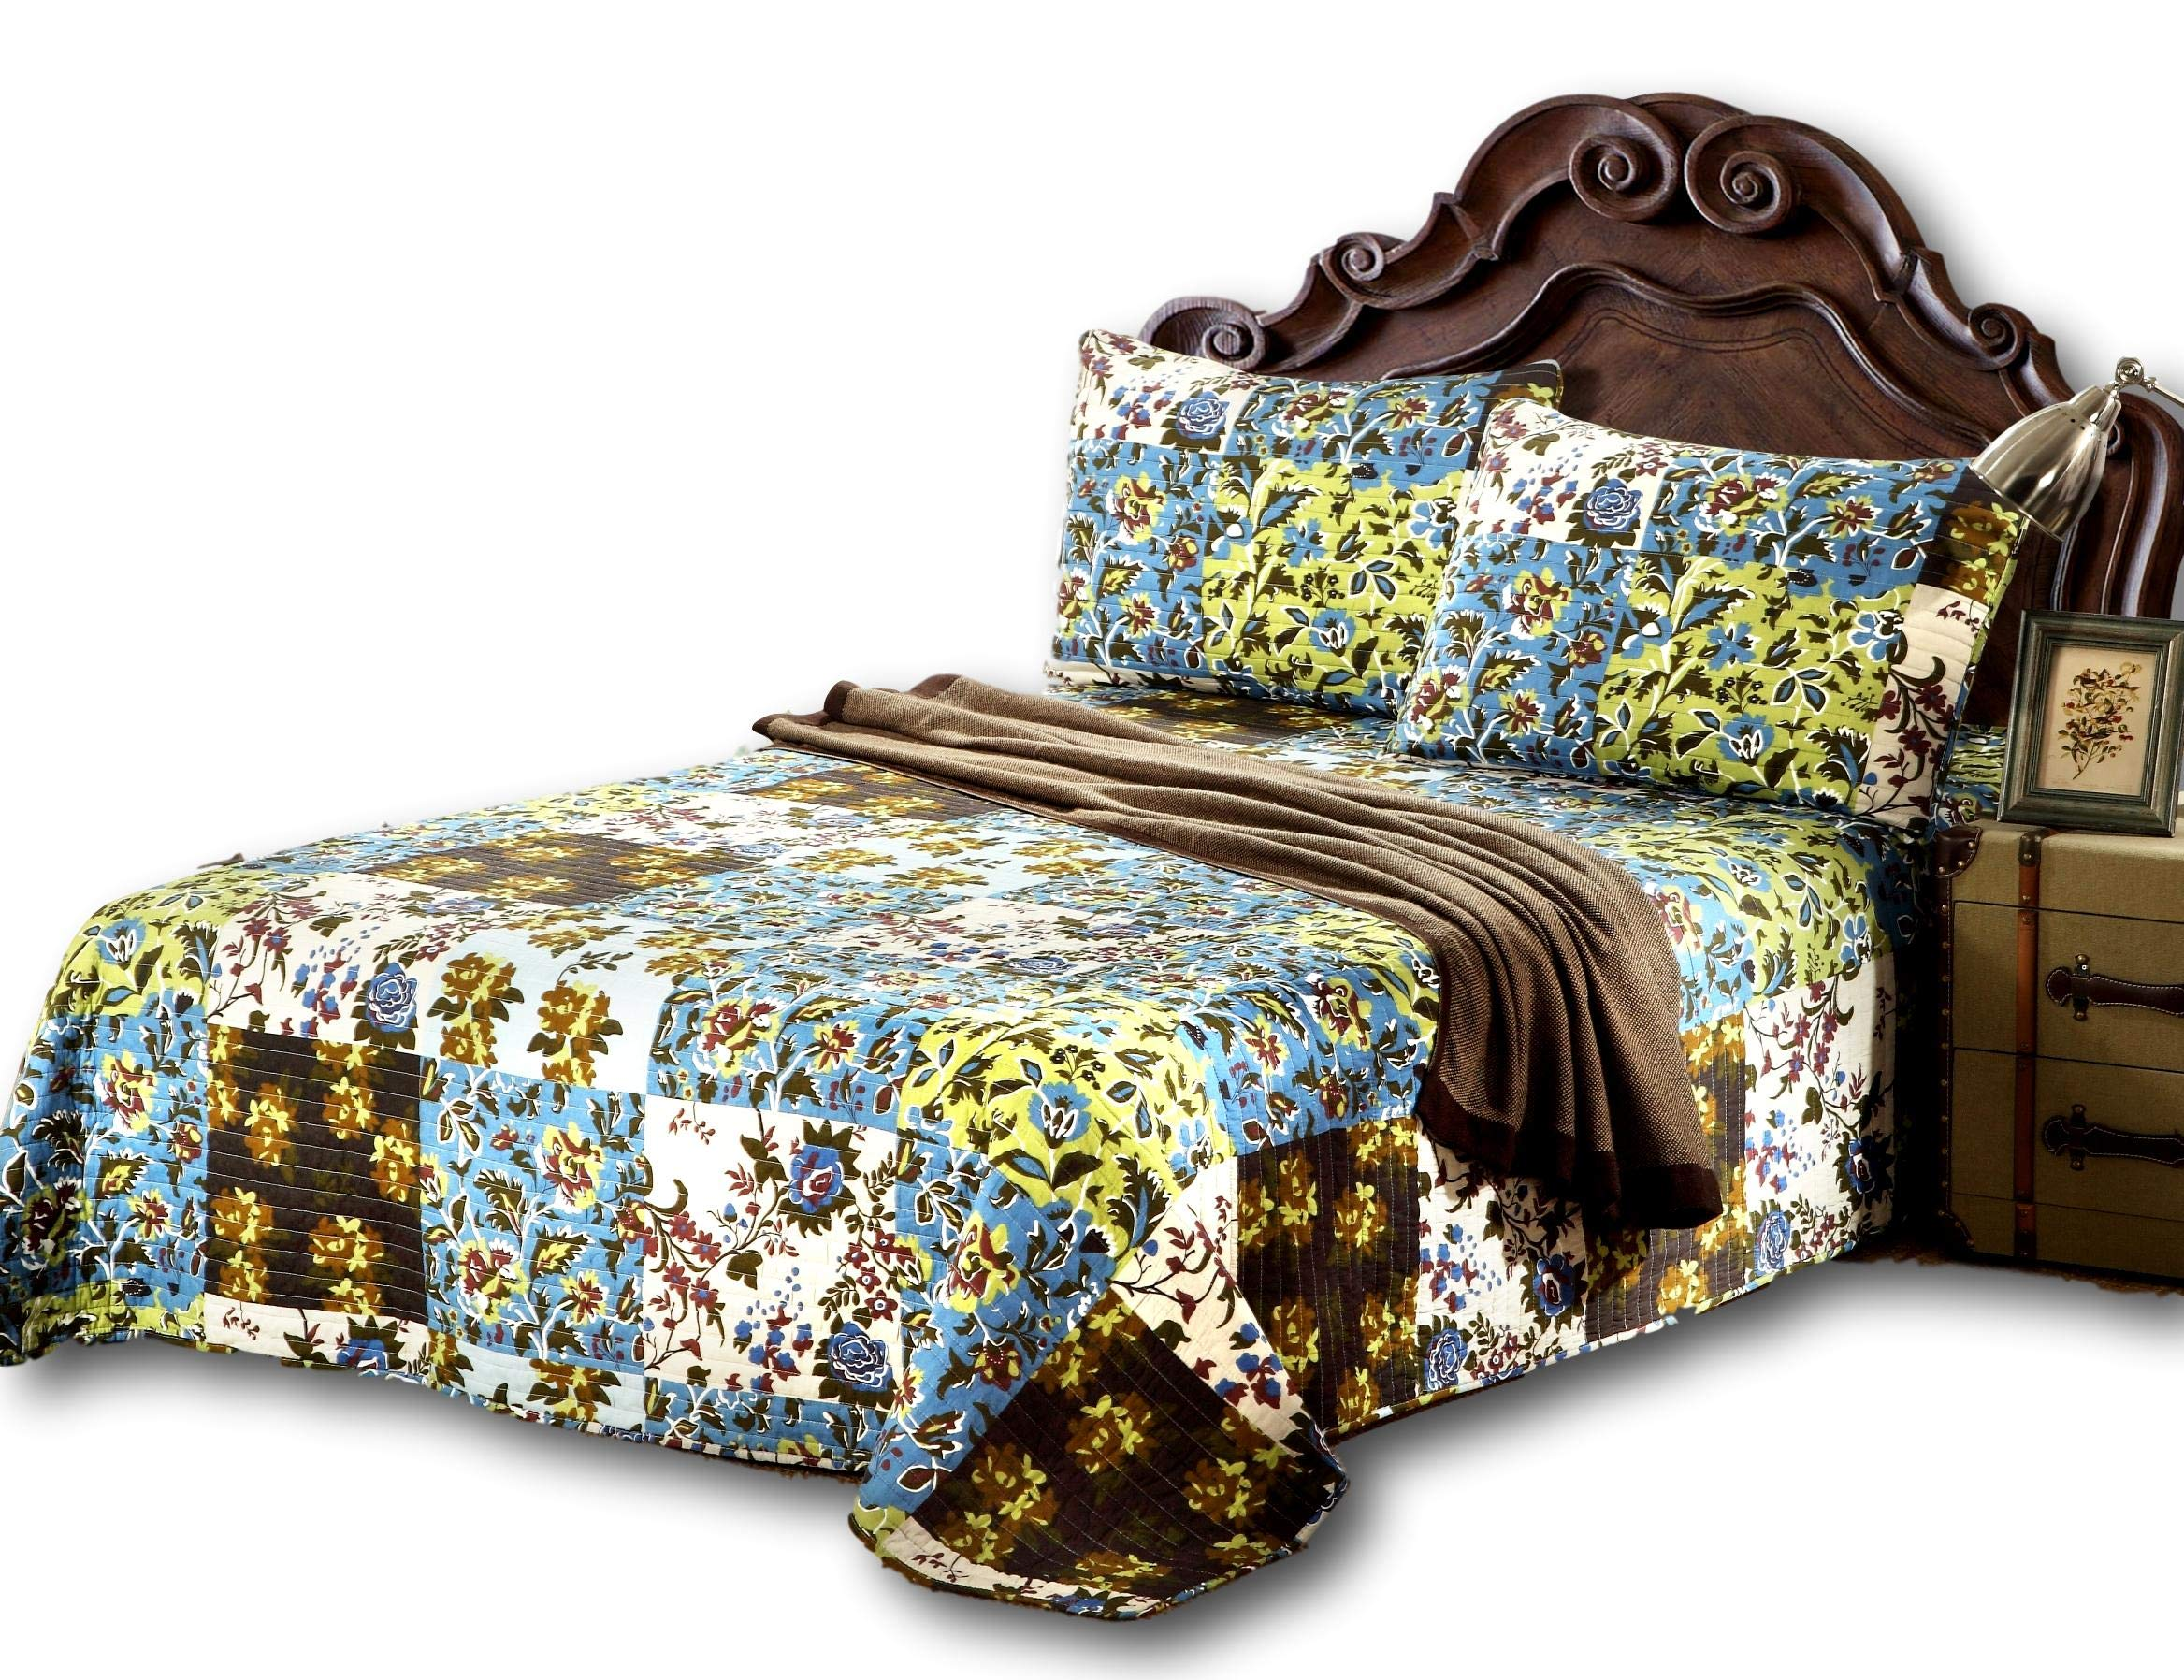 Tache Home Fashion KST1504-Cal King 3 Piece 100% Cotton Floral Blue Mystical Autumn Leaves Reversible Bedspread Quilt Set, California King